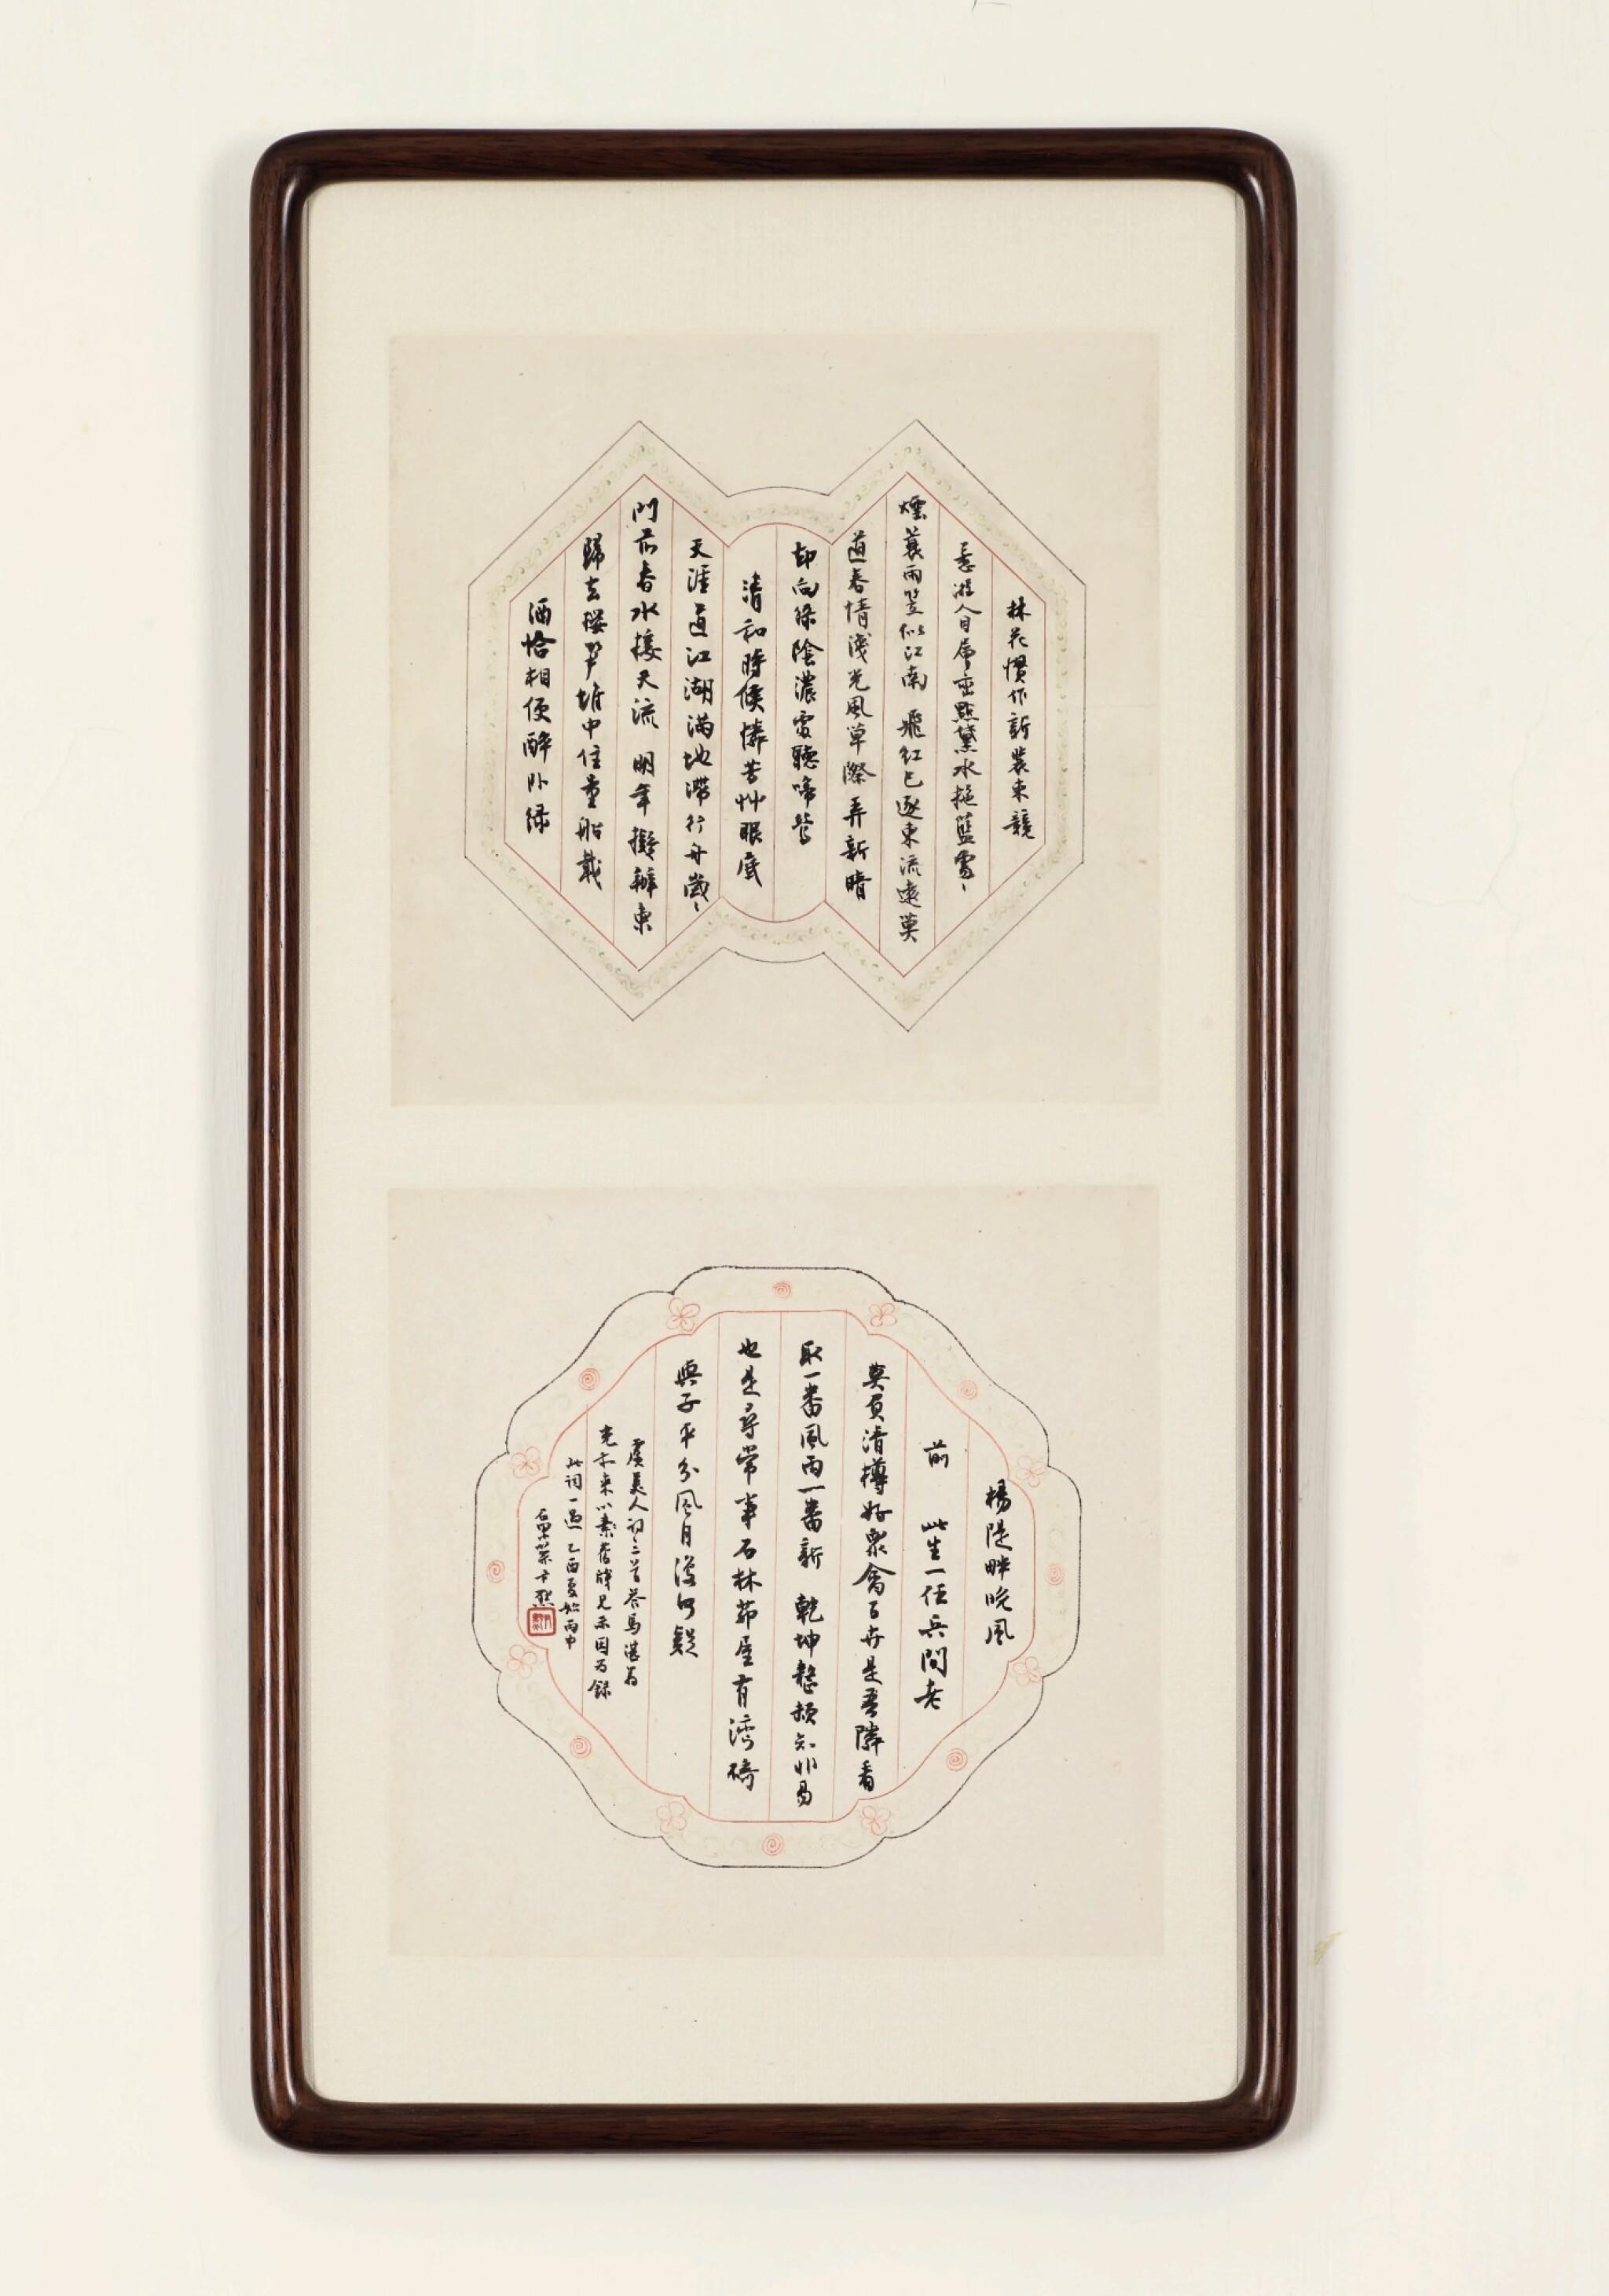 View full screen - View 1 of Lot 3026. SHEN YINMO 沈尹默 | THREE POEMS DEDICATED TO ZHANG CHONGHE 贈張充和〈虞美人〉三首.